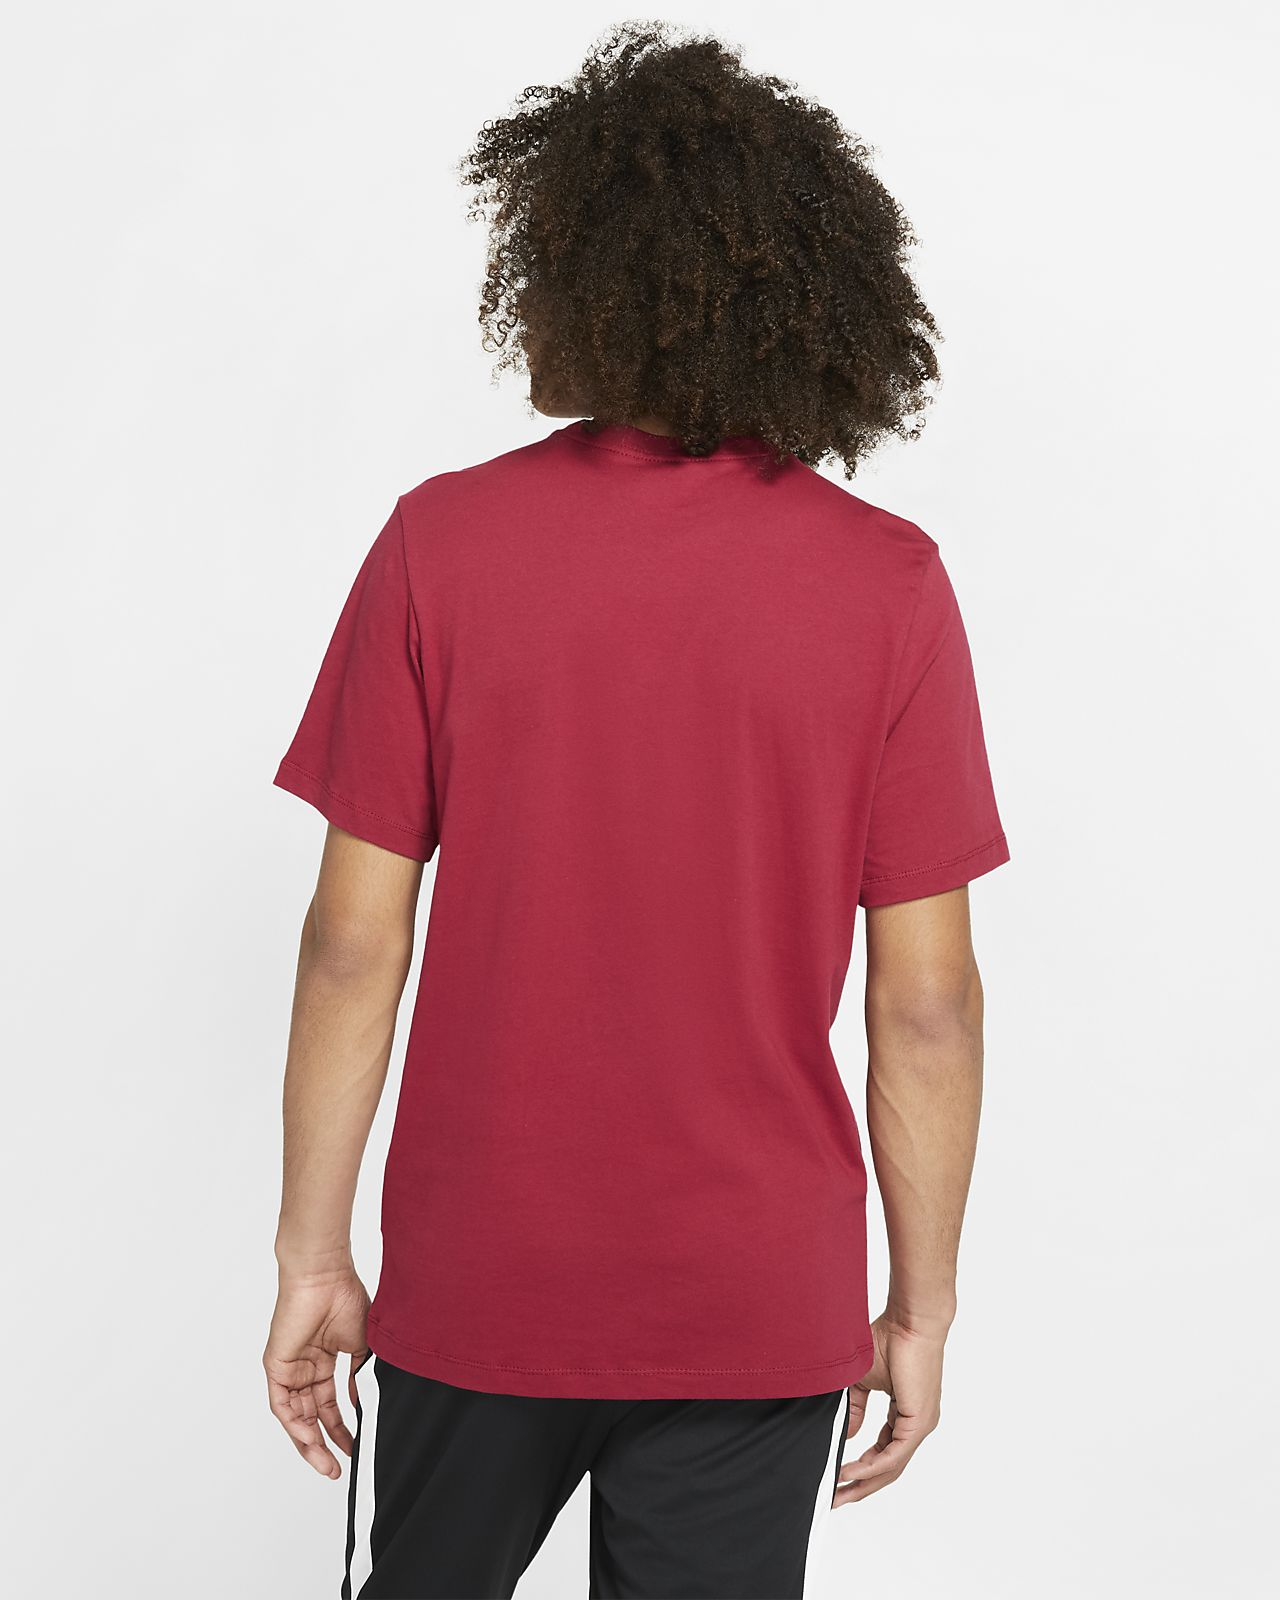 Homme Tee Barcelona De Football Fc Shirt Pour yOvNnwPm80